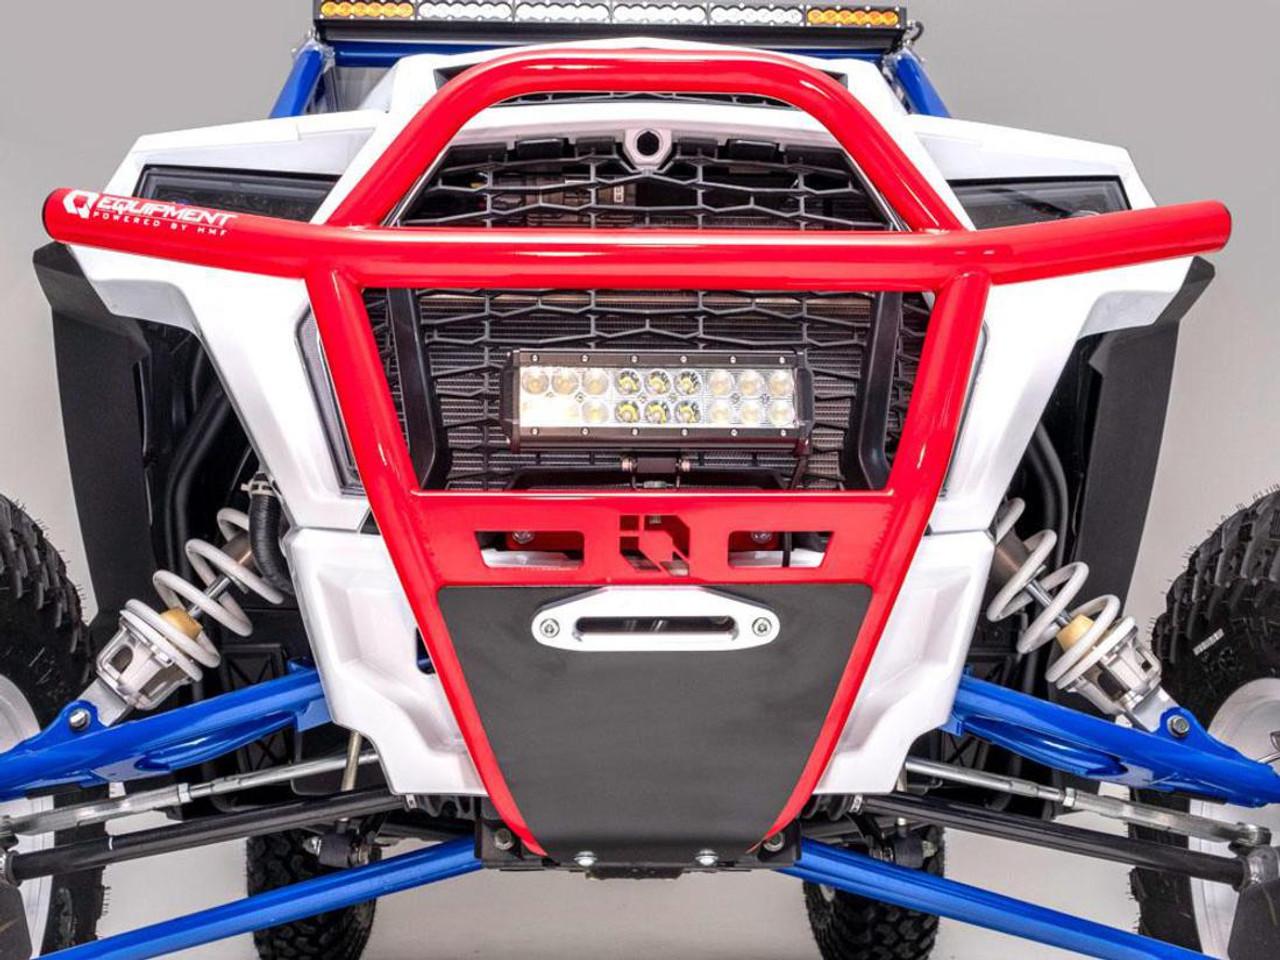 HMF IQ HD Front Bumper Polaris RZR XP 1000//Turbo//Turbo S 2019 9357212483 White